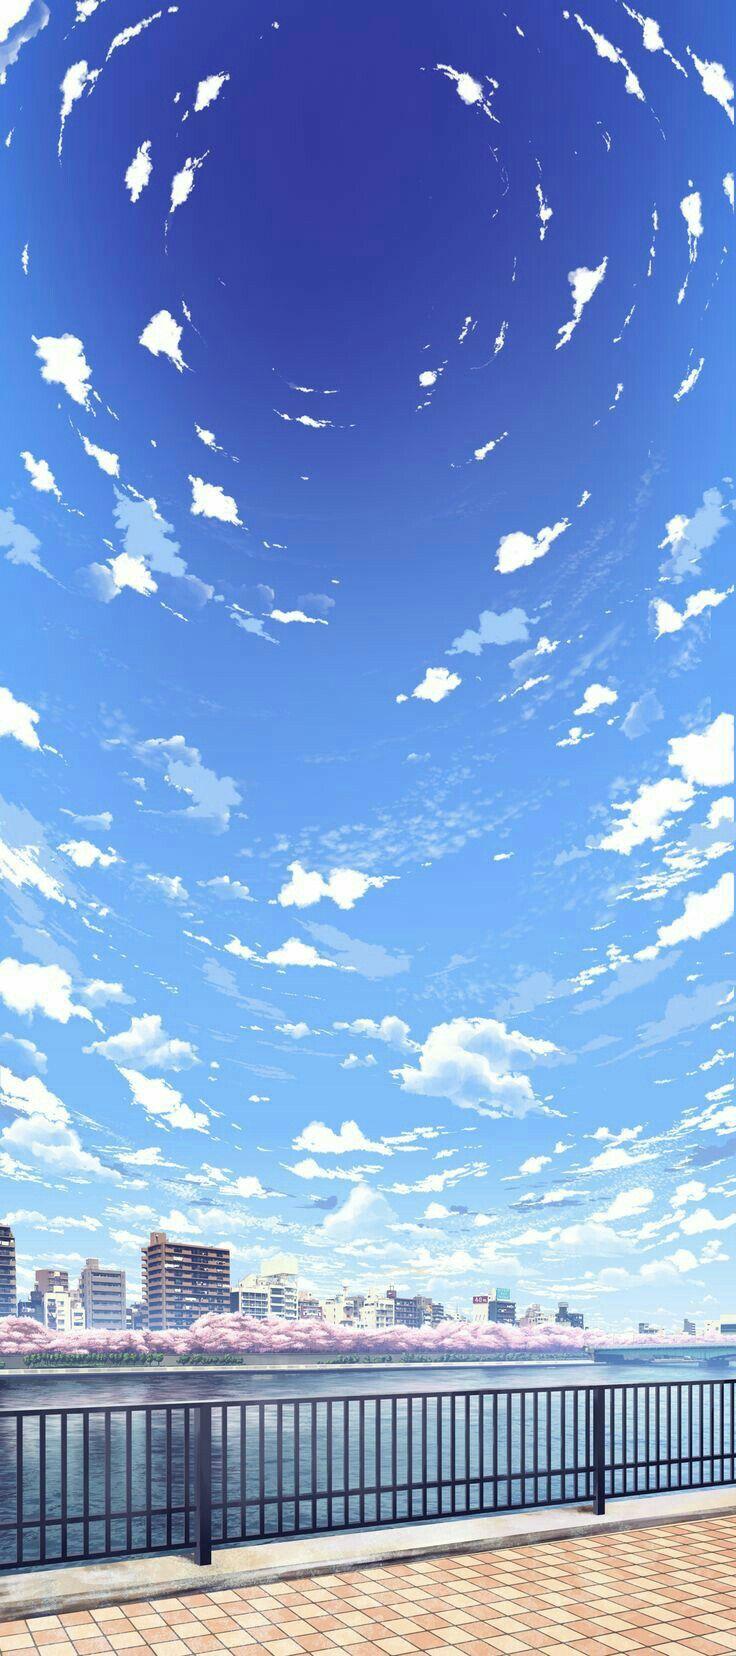 Animewallpaper Wallpaper Kawaii Sky Ezmkurd خلفيات انمي انمي غلاف Anime Sky Wallpaper Anime Scenery Landscape Wallpaper Scenery Wallpaper